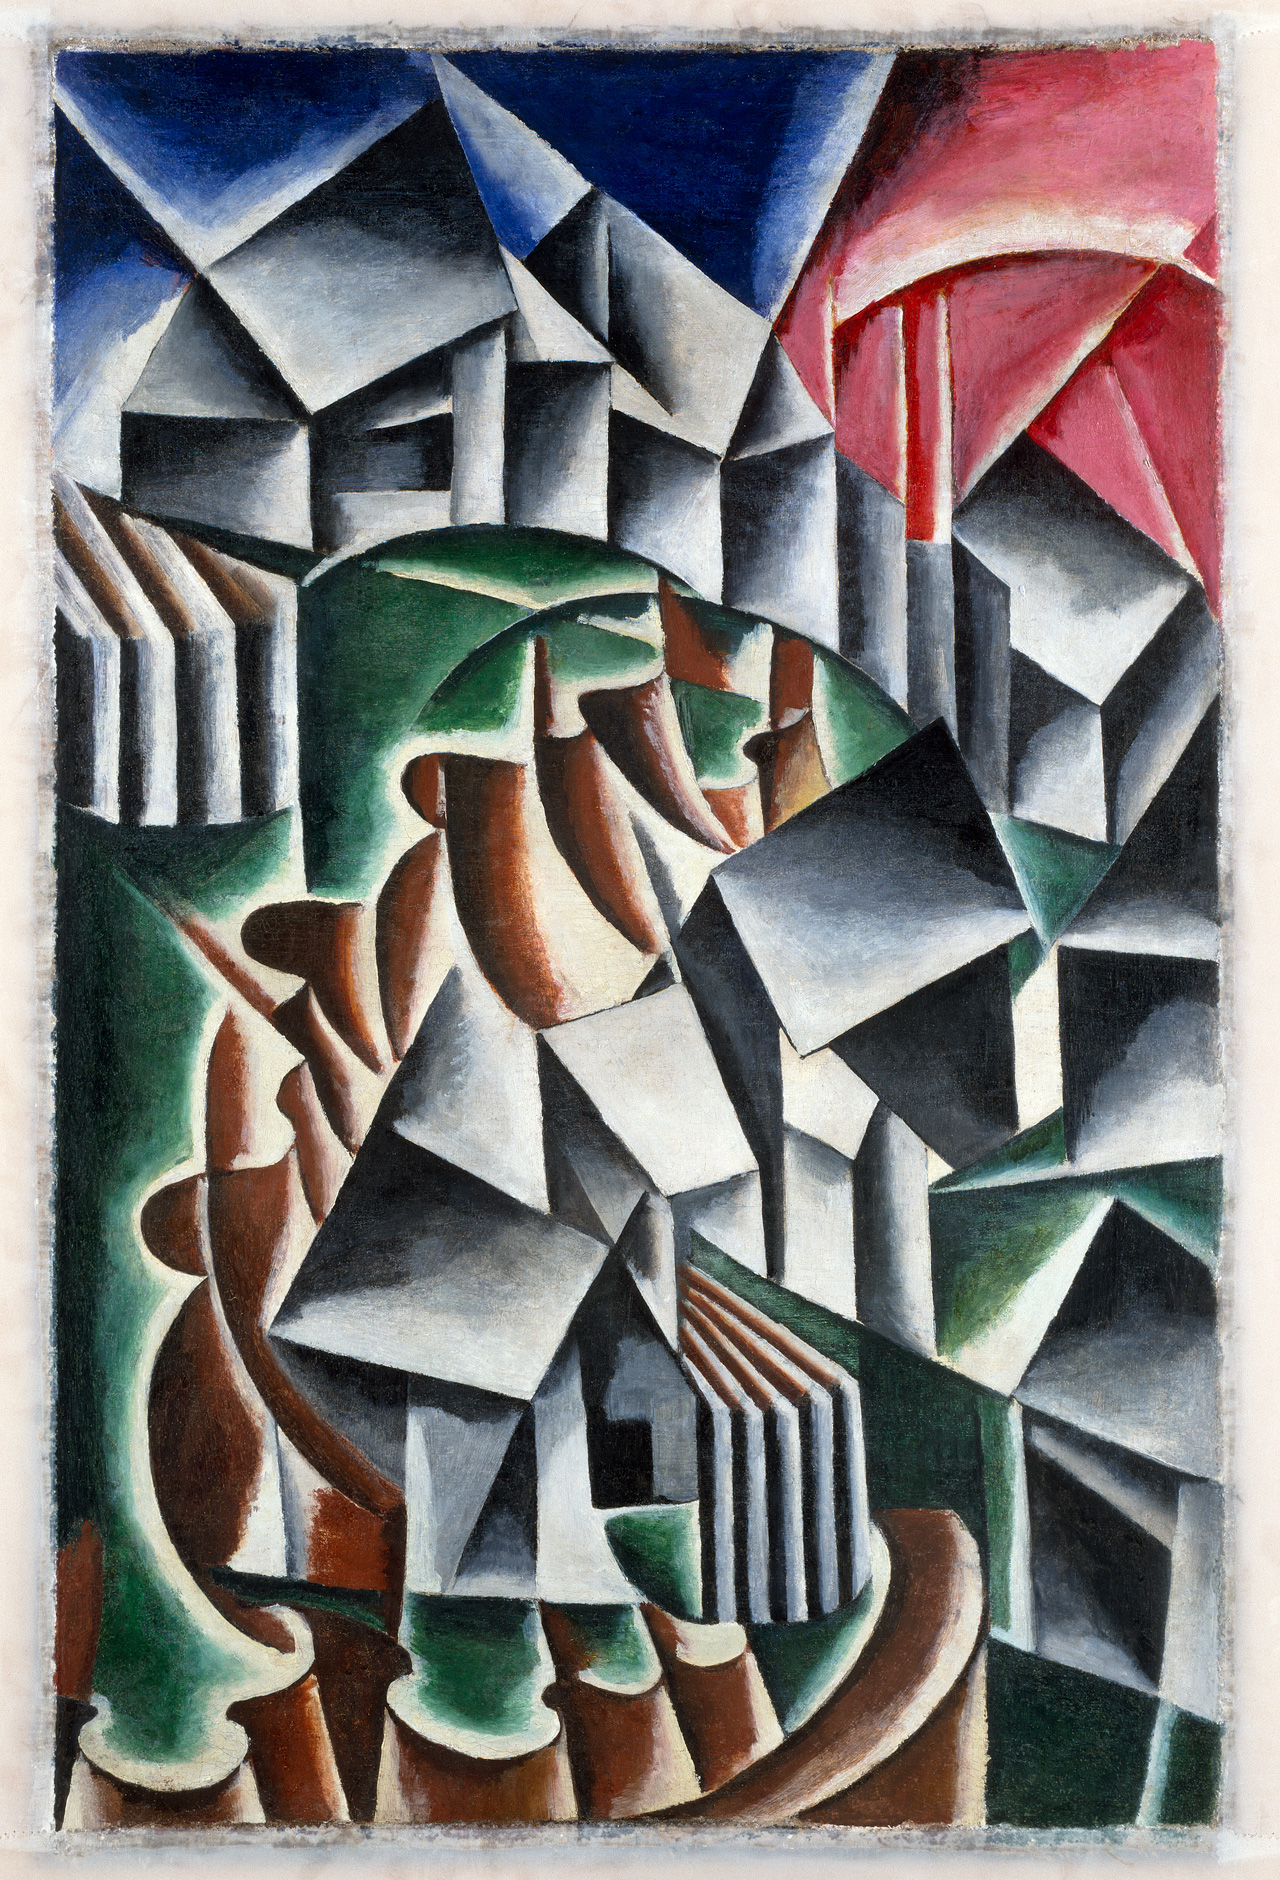 "Liubov Popova, ""Birsk"" (1916), oil on canvas, 41 3/4 x 27 3/8 inches (106 x 69.5 cm), Solomon R. Guggenheim Museum, New York Gift, George Costakis, 1981 (image © Solomon R. Guggenheim Museum)"